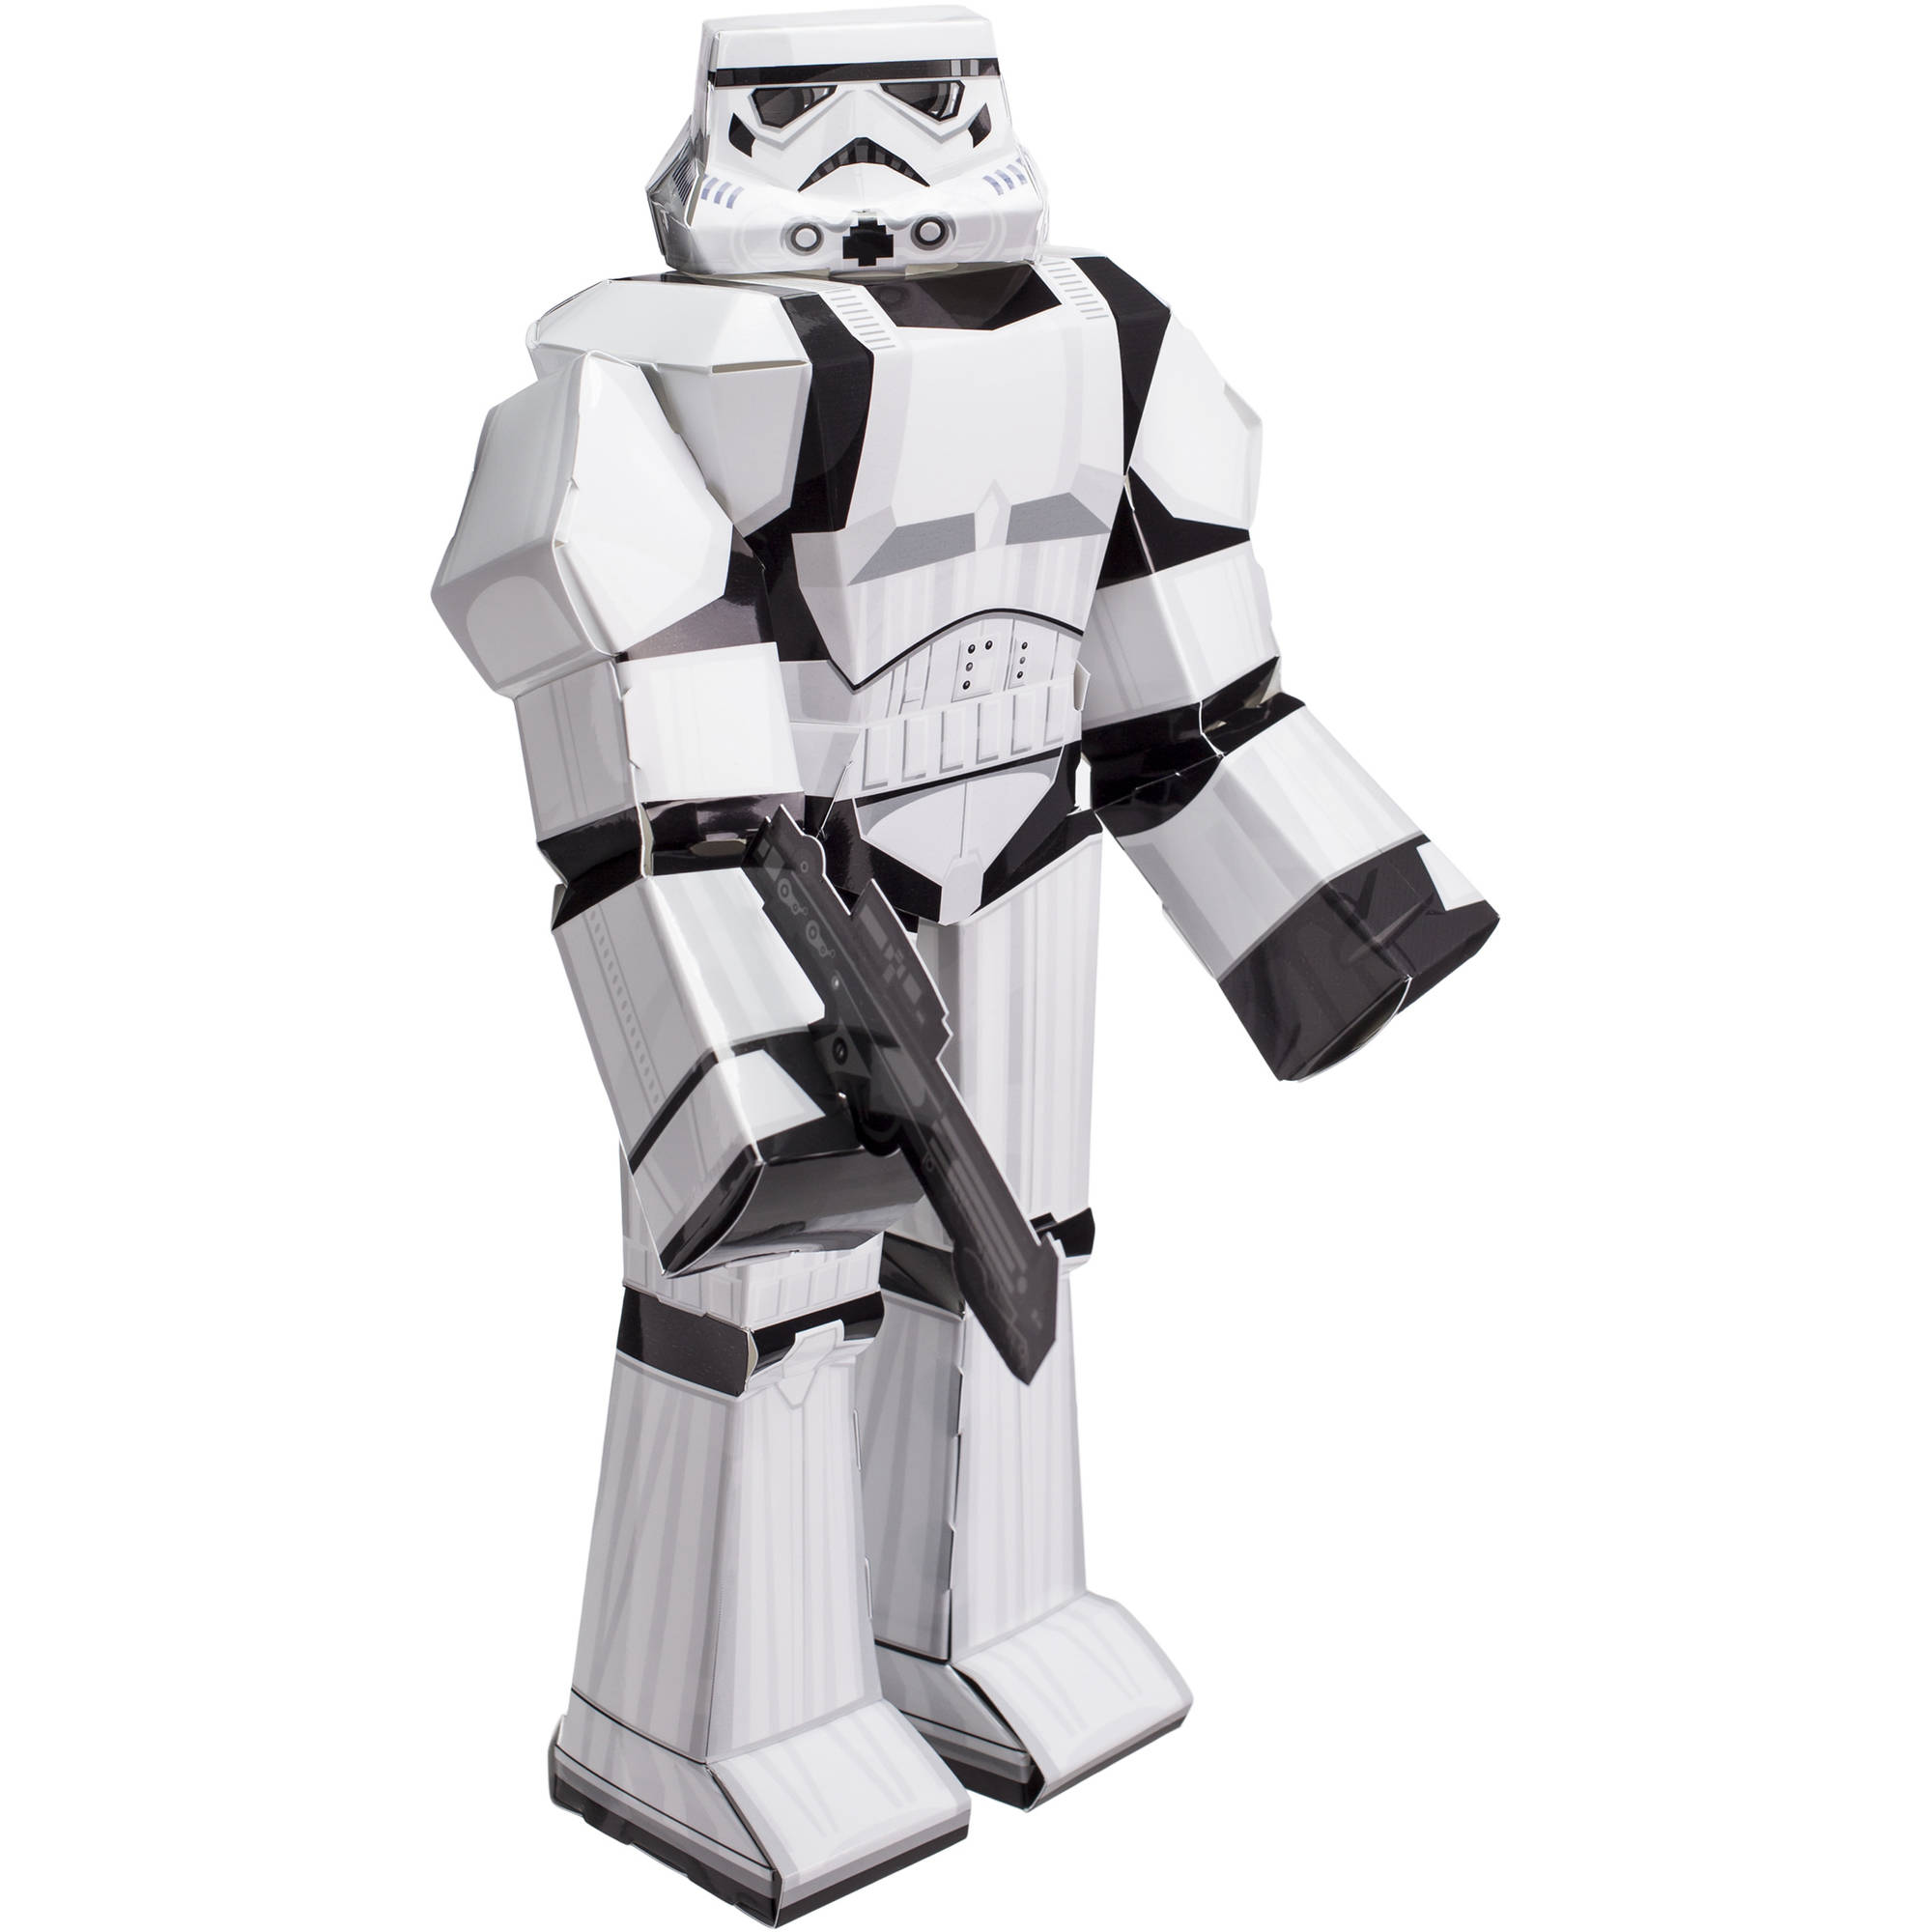 Star wars blueprint papercraft 12 inch stormtrooper figure walmart malvernweather Gallery